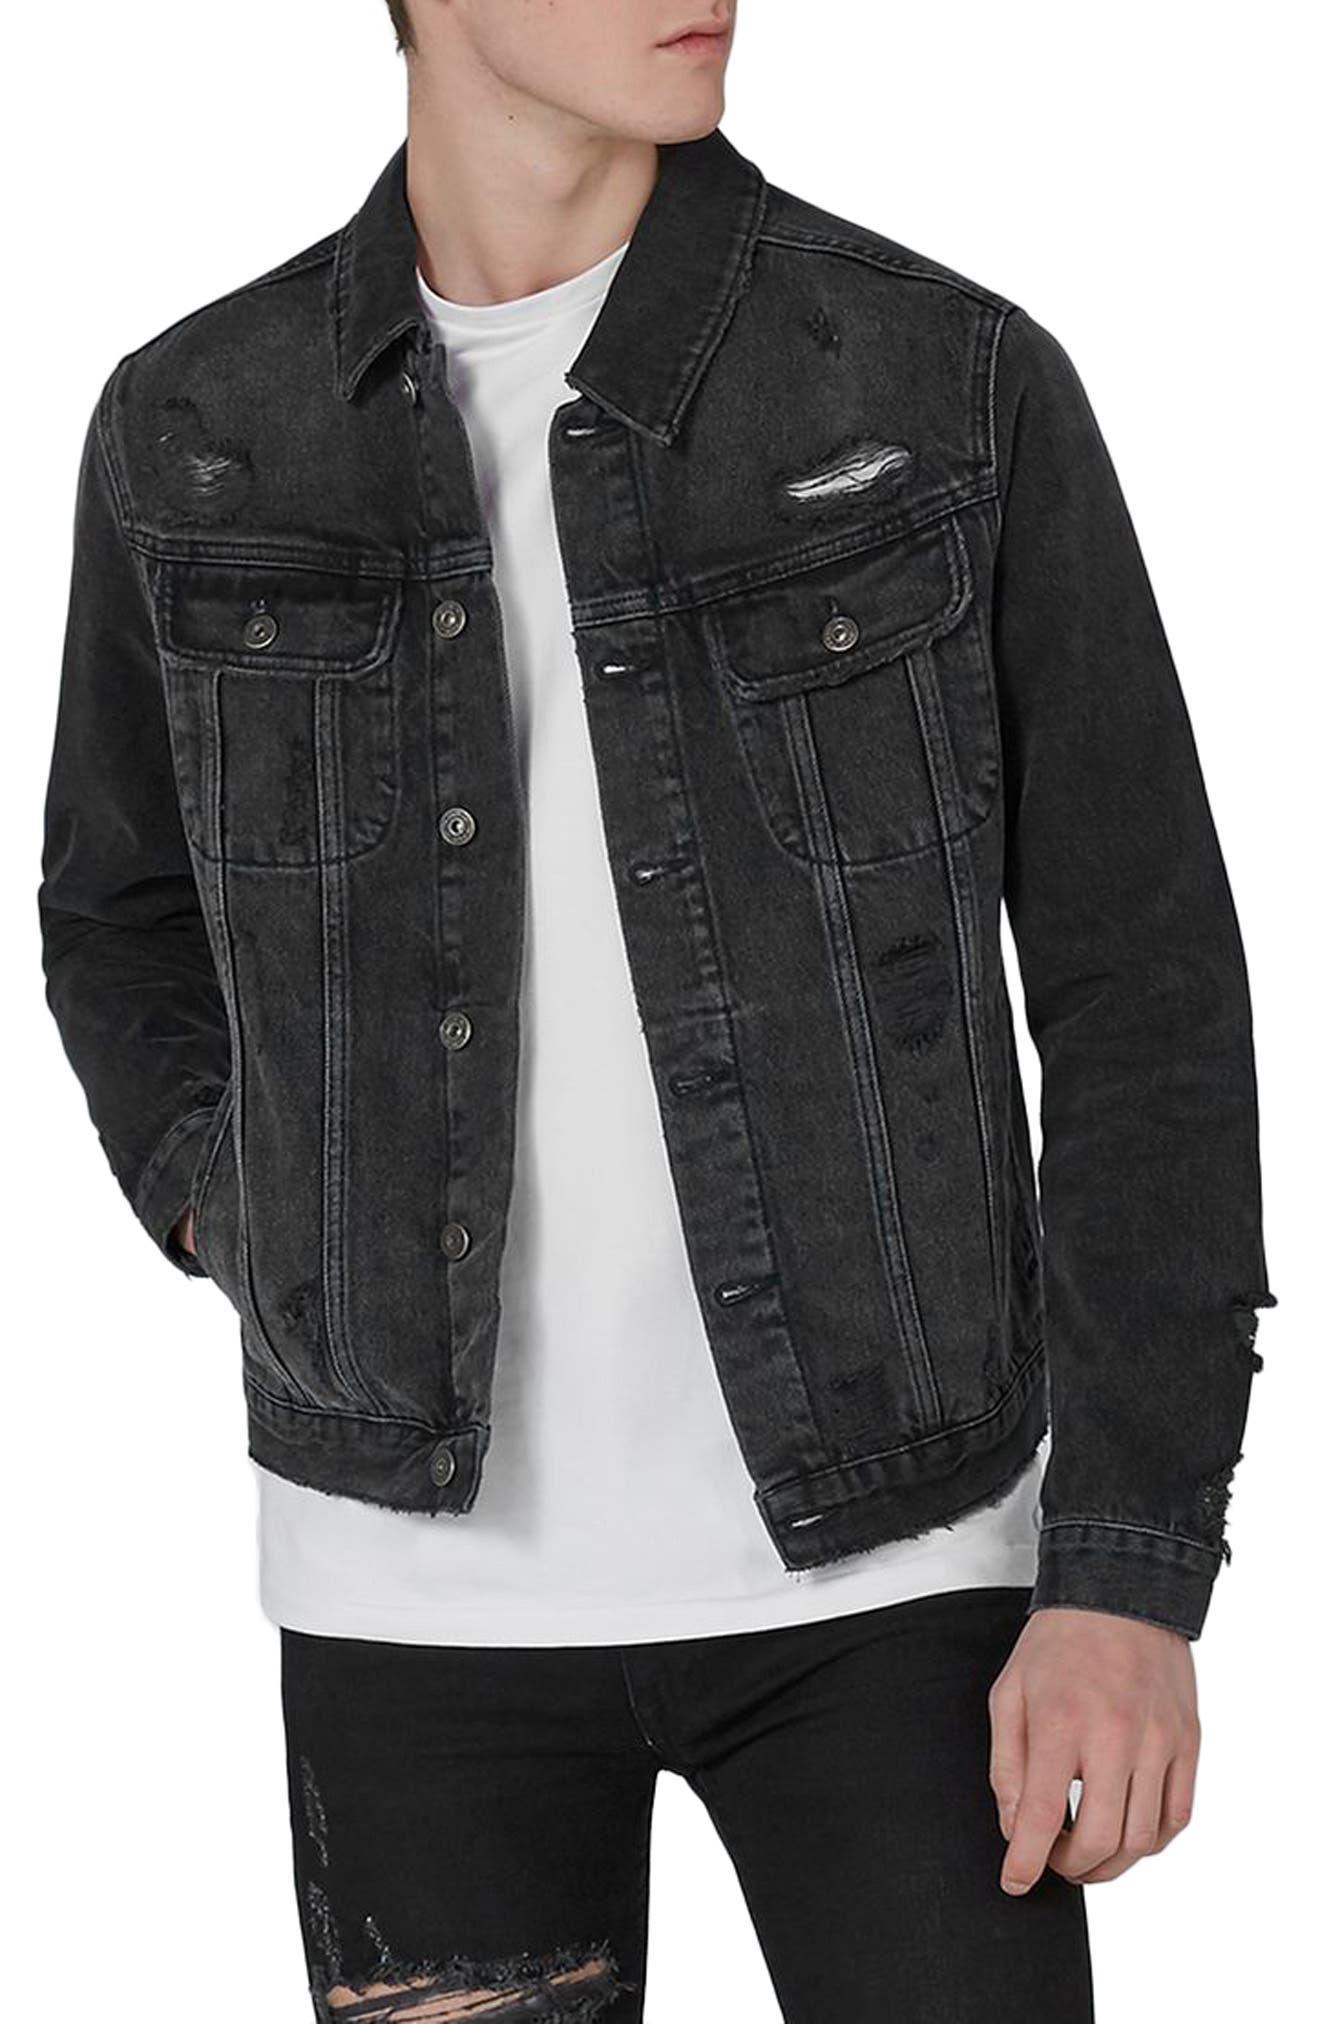 Alternate Image 1 Selected - Topman Piro Distressed Denim Jacket